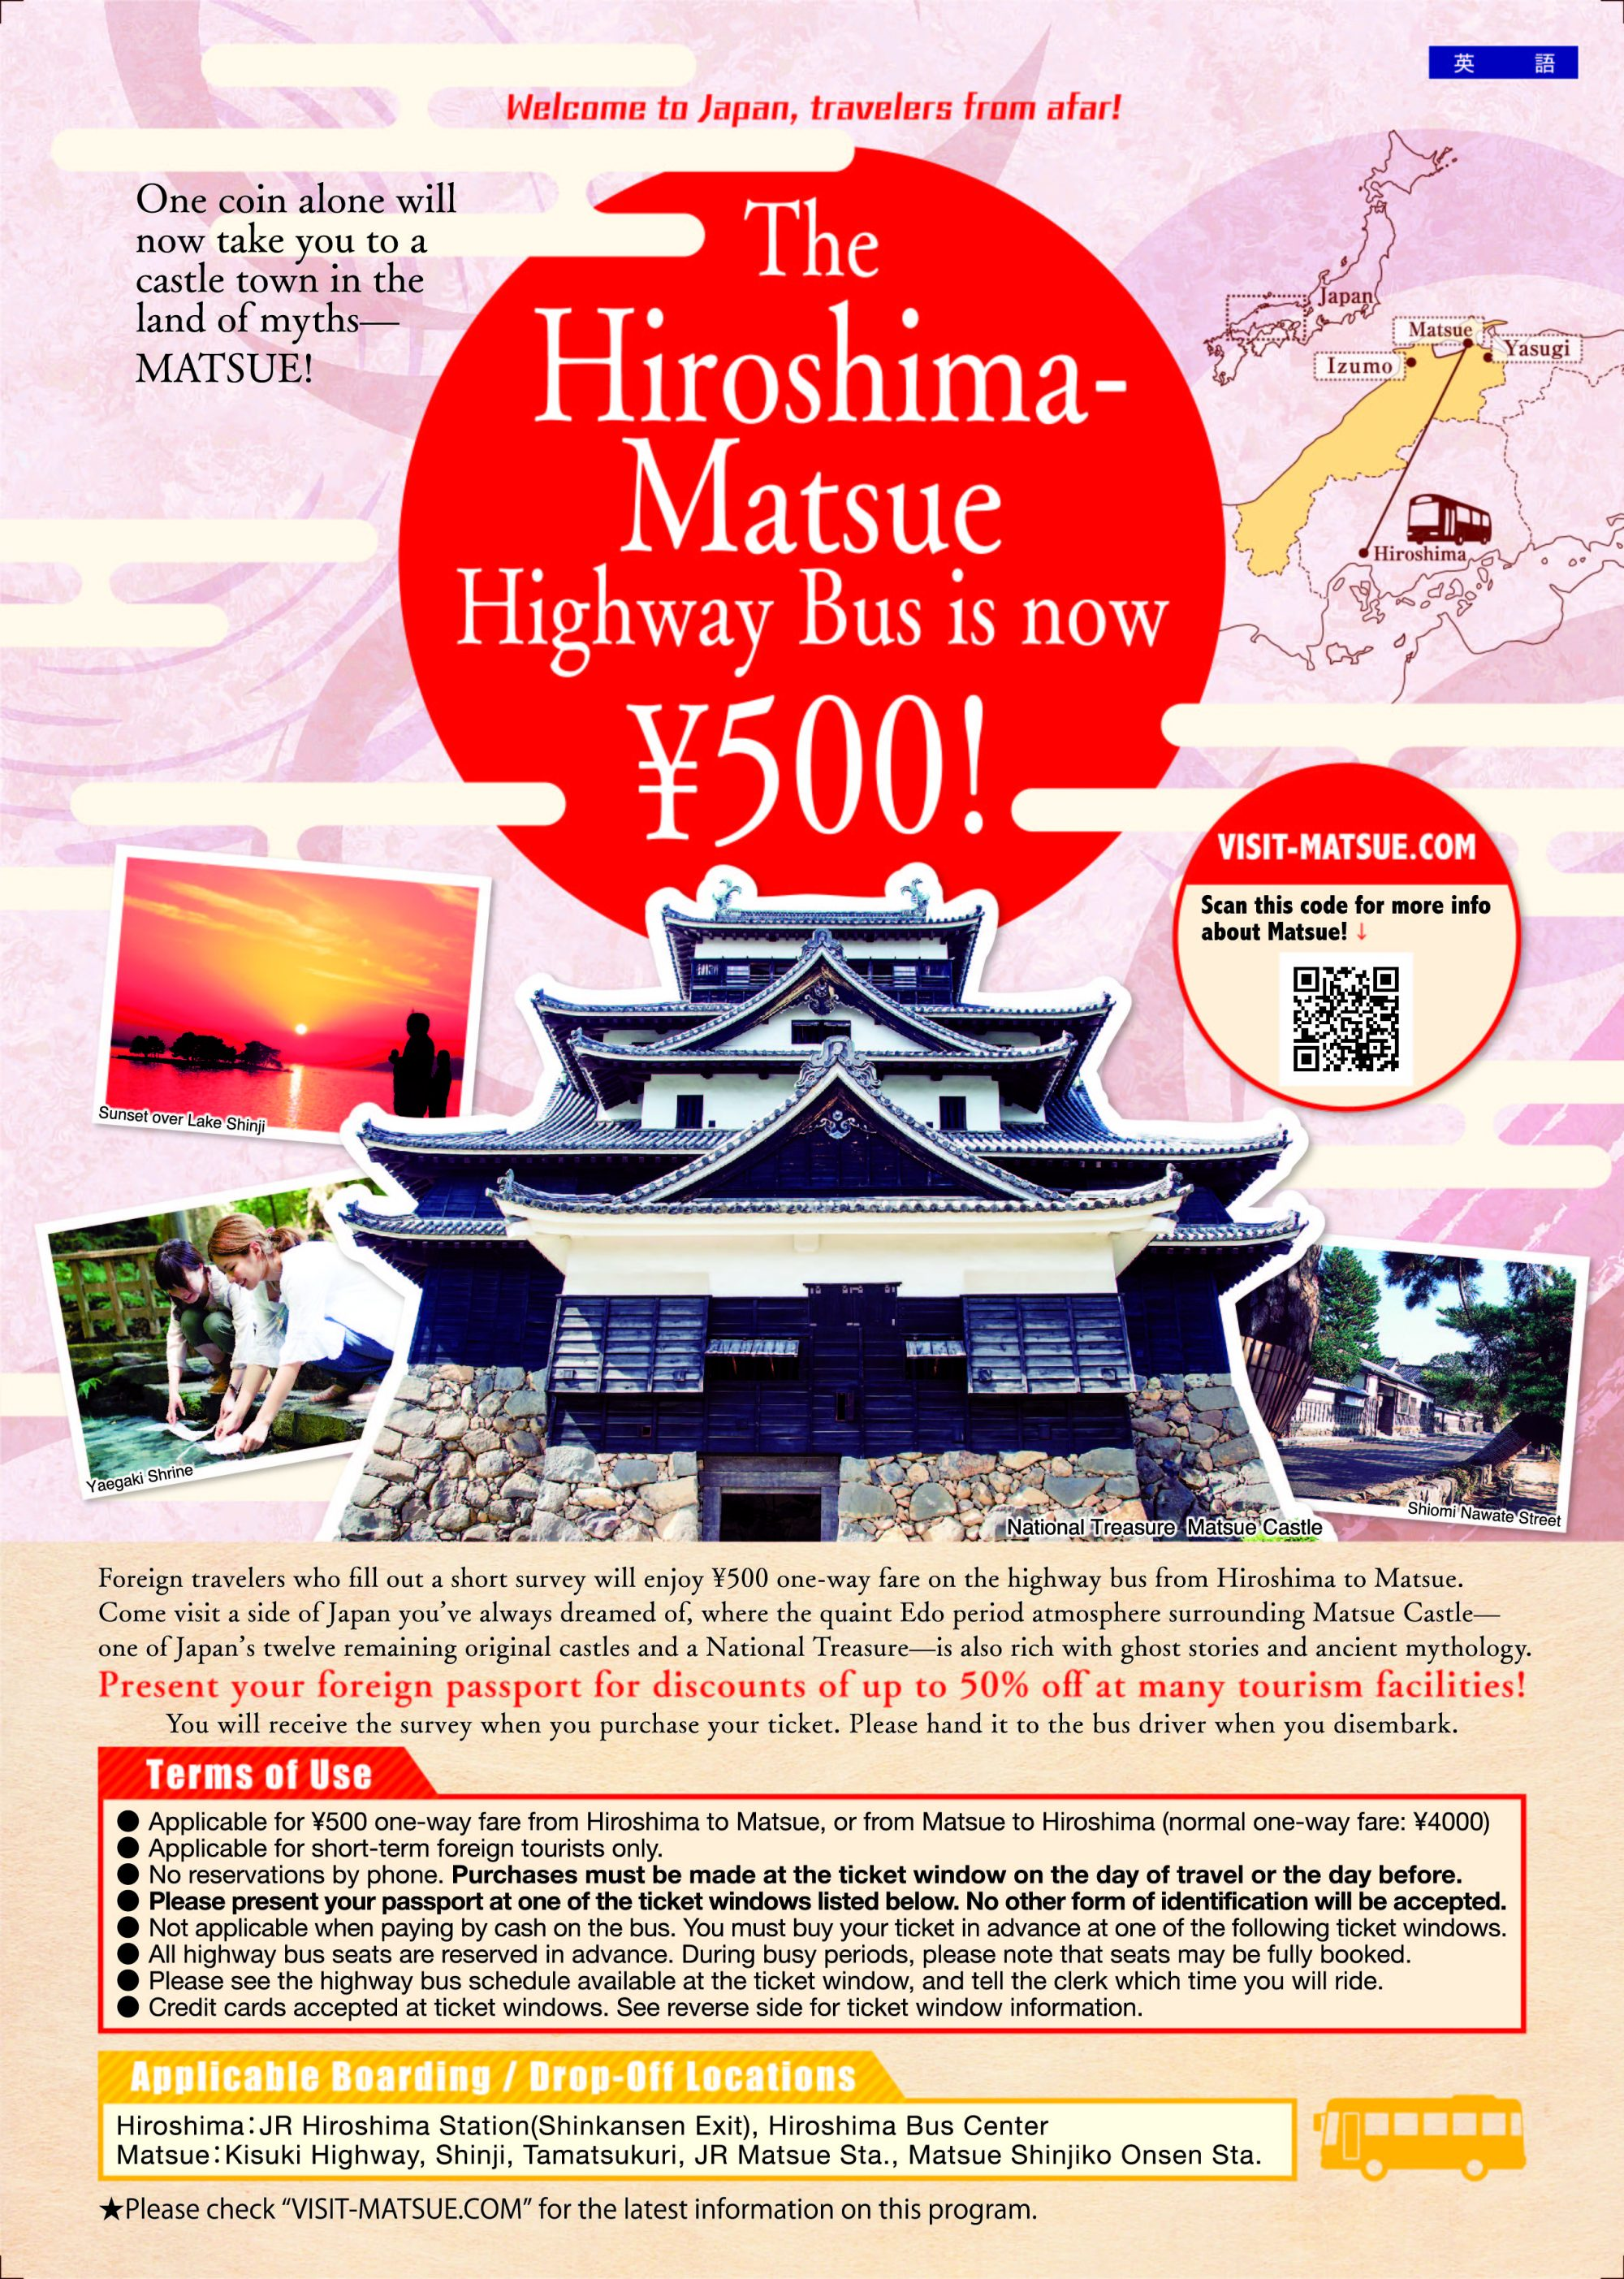 Hiroshima Matsue 500 yen bus